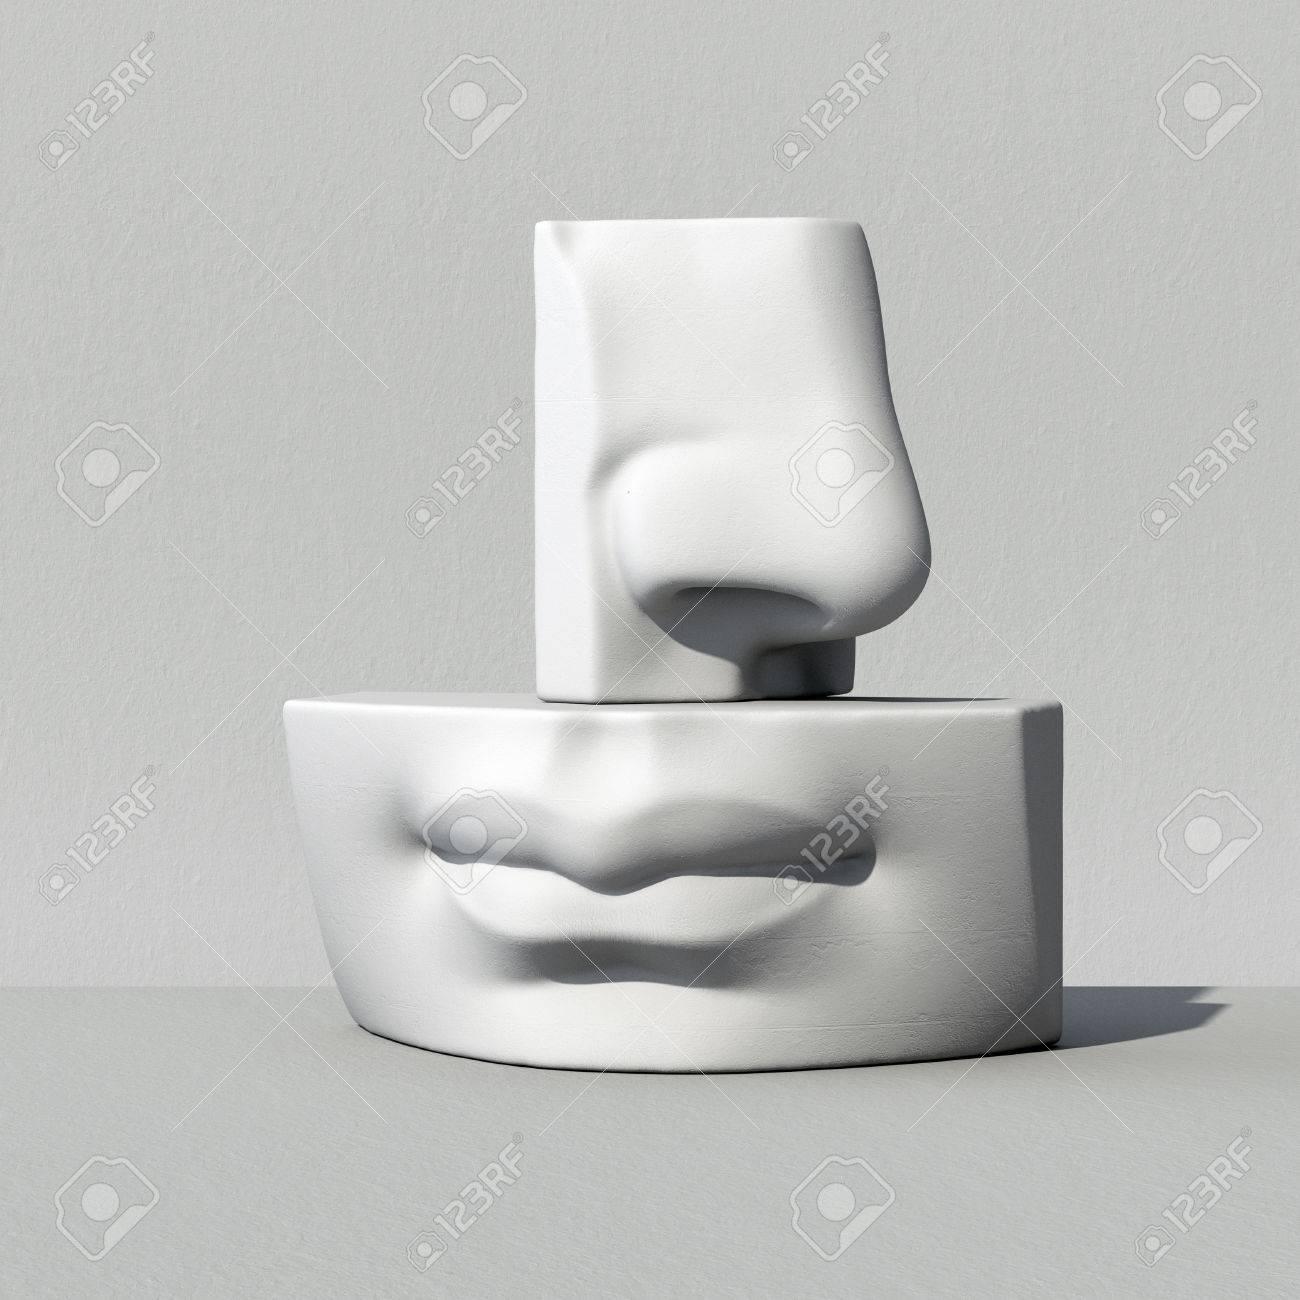 3d, Digitale Illustration, Abstrakte Alabaster Blöcke, Nase, Lippen ...